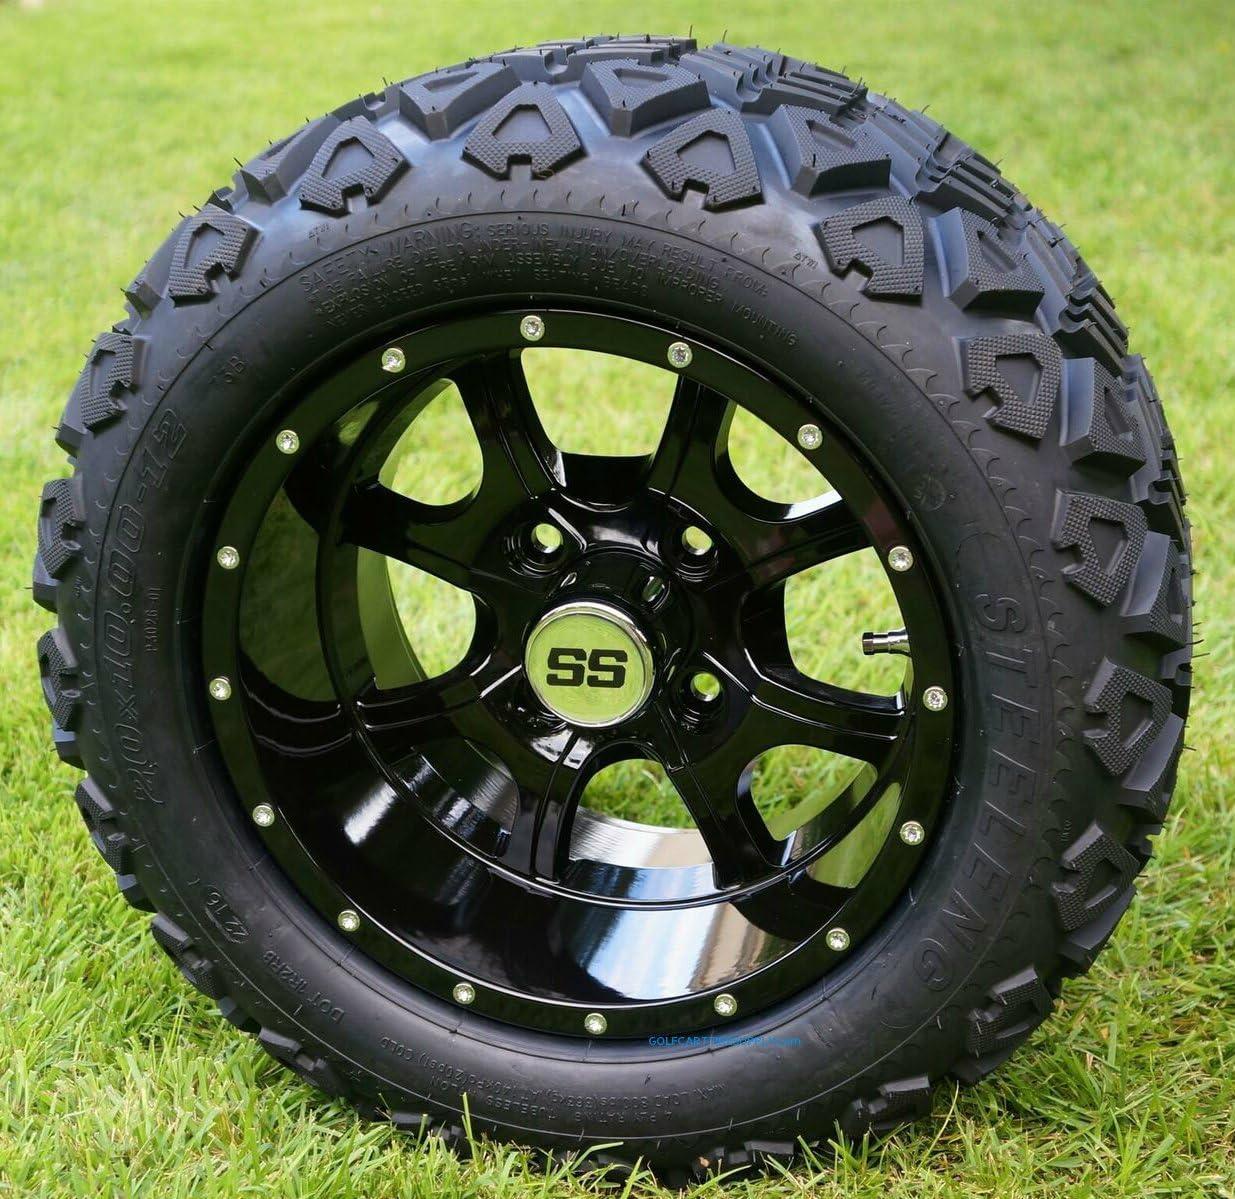 Amazon Com 12 Stalker Gloss Black Golf Cart Wheels And 20x10 12 Dot All Terrain Golf Cart Tires Set Of 4 No Lift Required Read Description Automotive